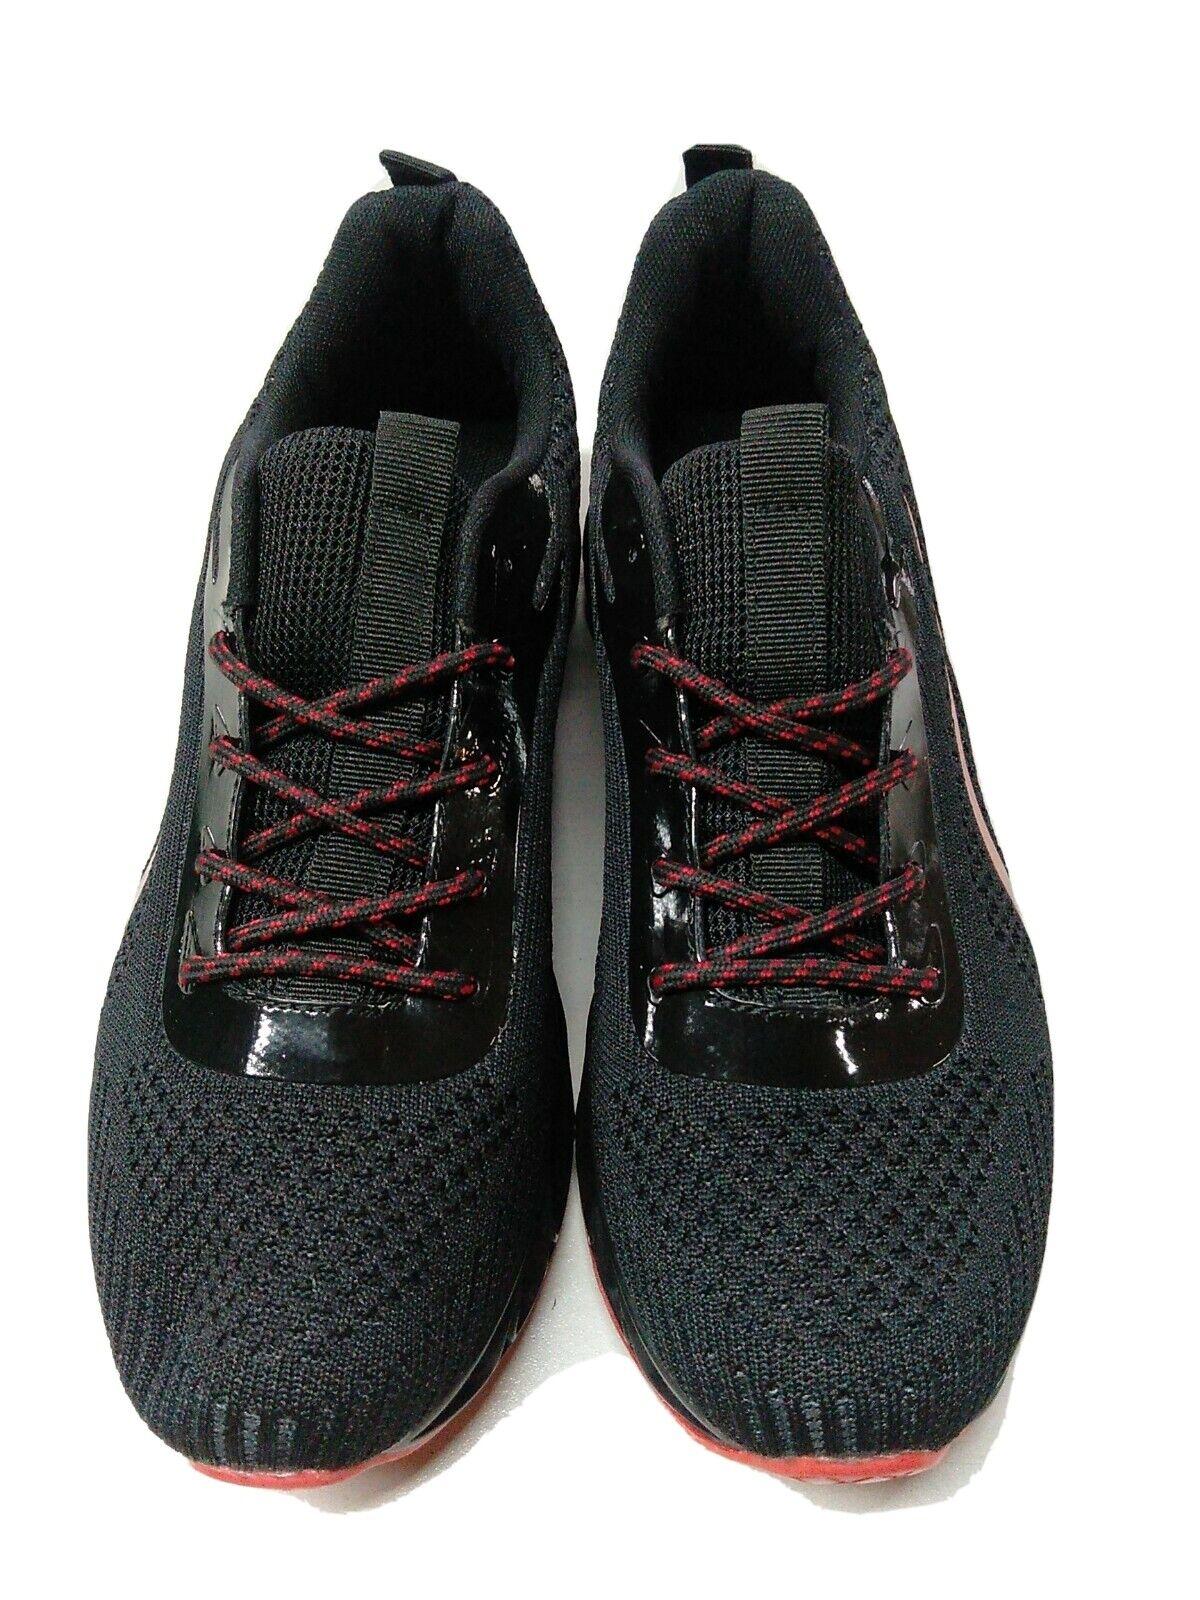 Men's Sneakers mesh Breathable UK SIZE 7 , EUR 41 walking slip on Running shoes